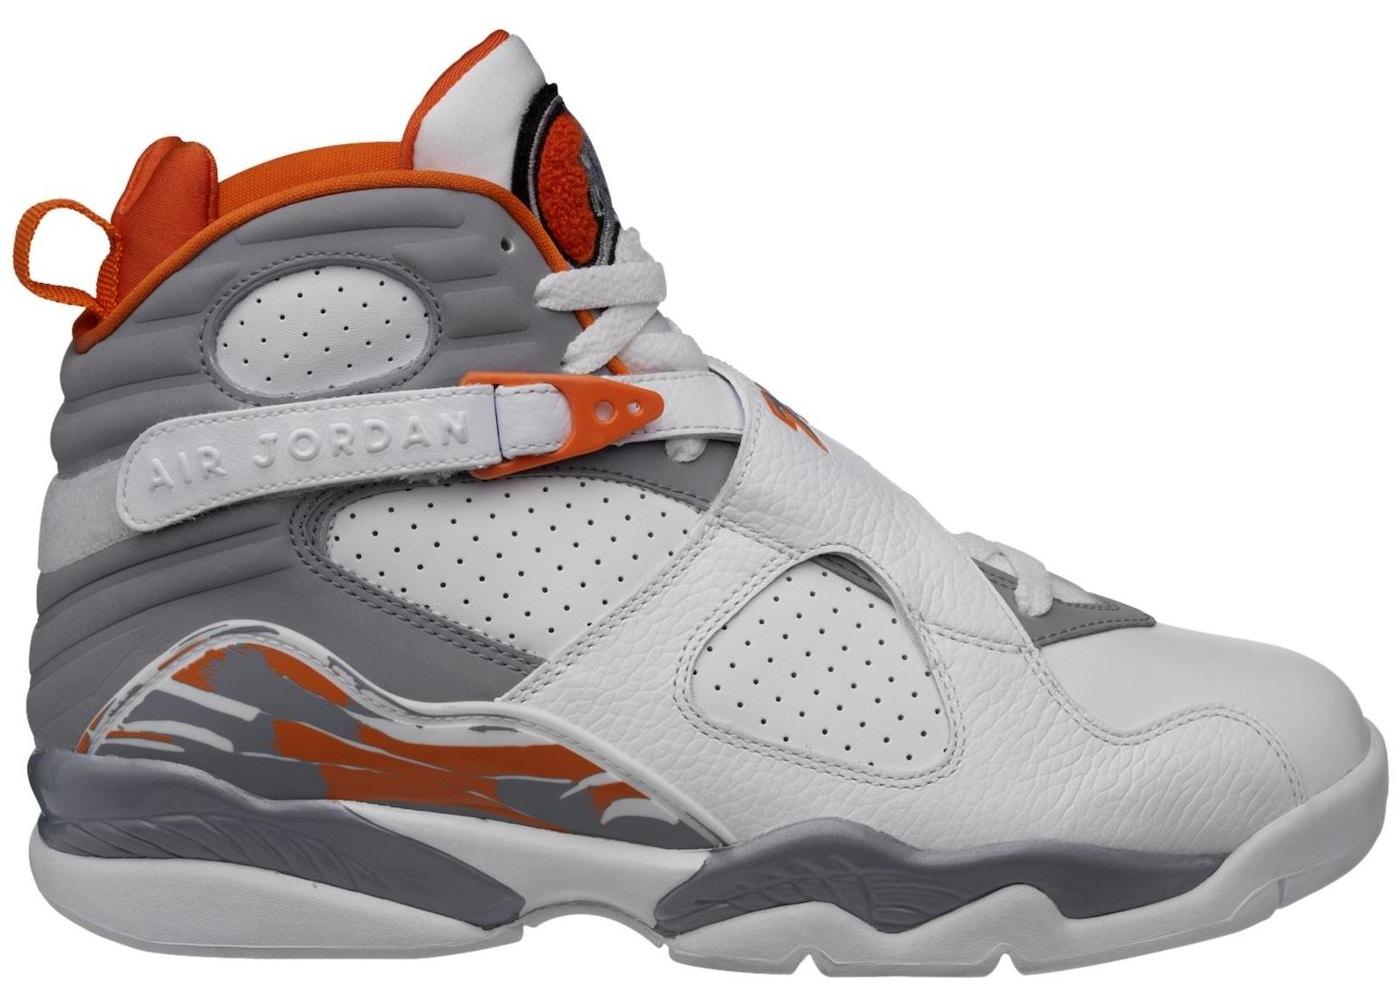 big sale a366a d5bce Jordan 8 Retro Orange White - 305381-102